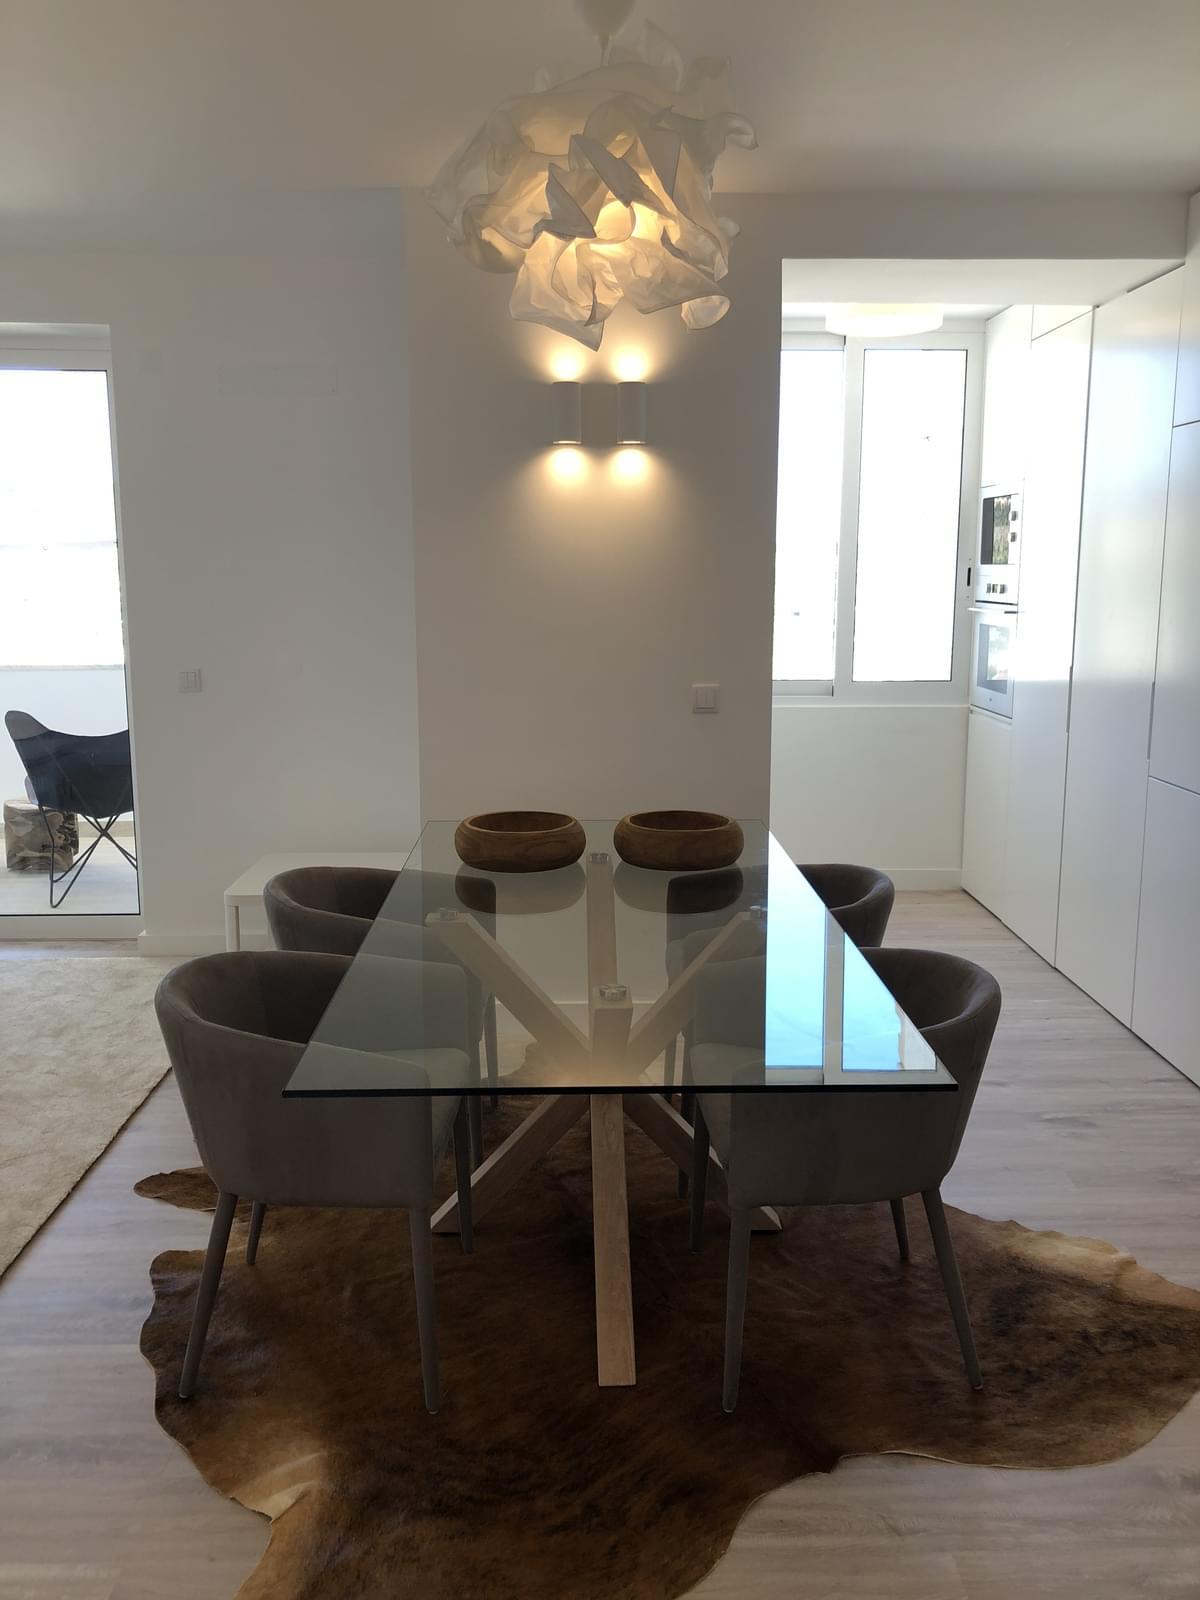 pf17249-apartamento-t2-almada-521c1ae5-246a-4299-b119-ac66cabf83c0